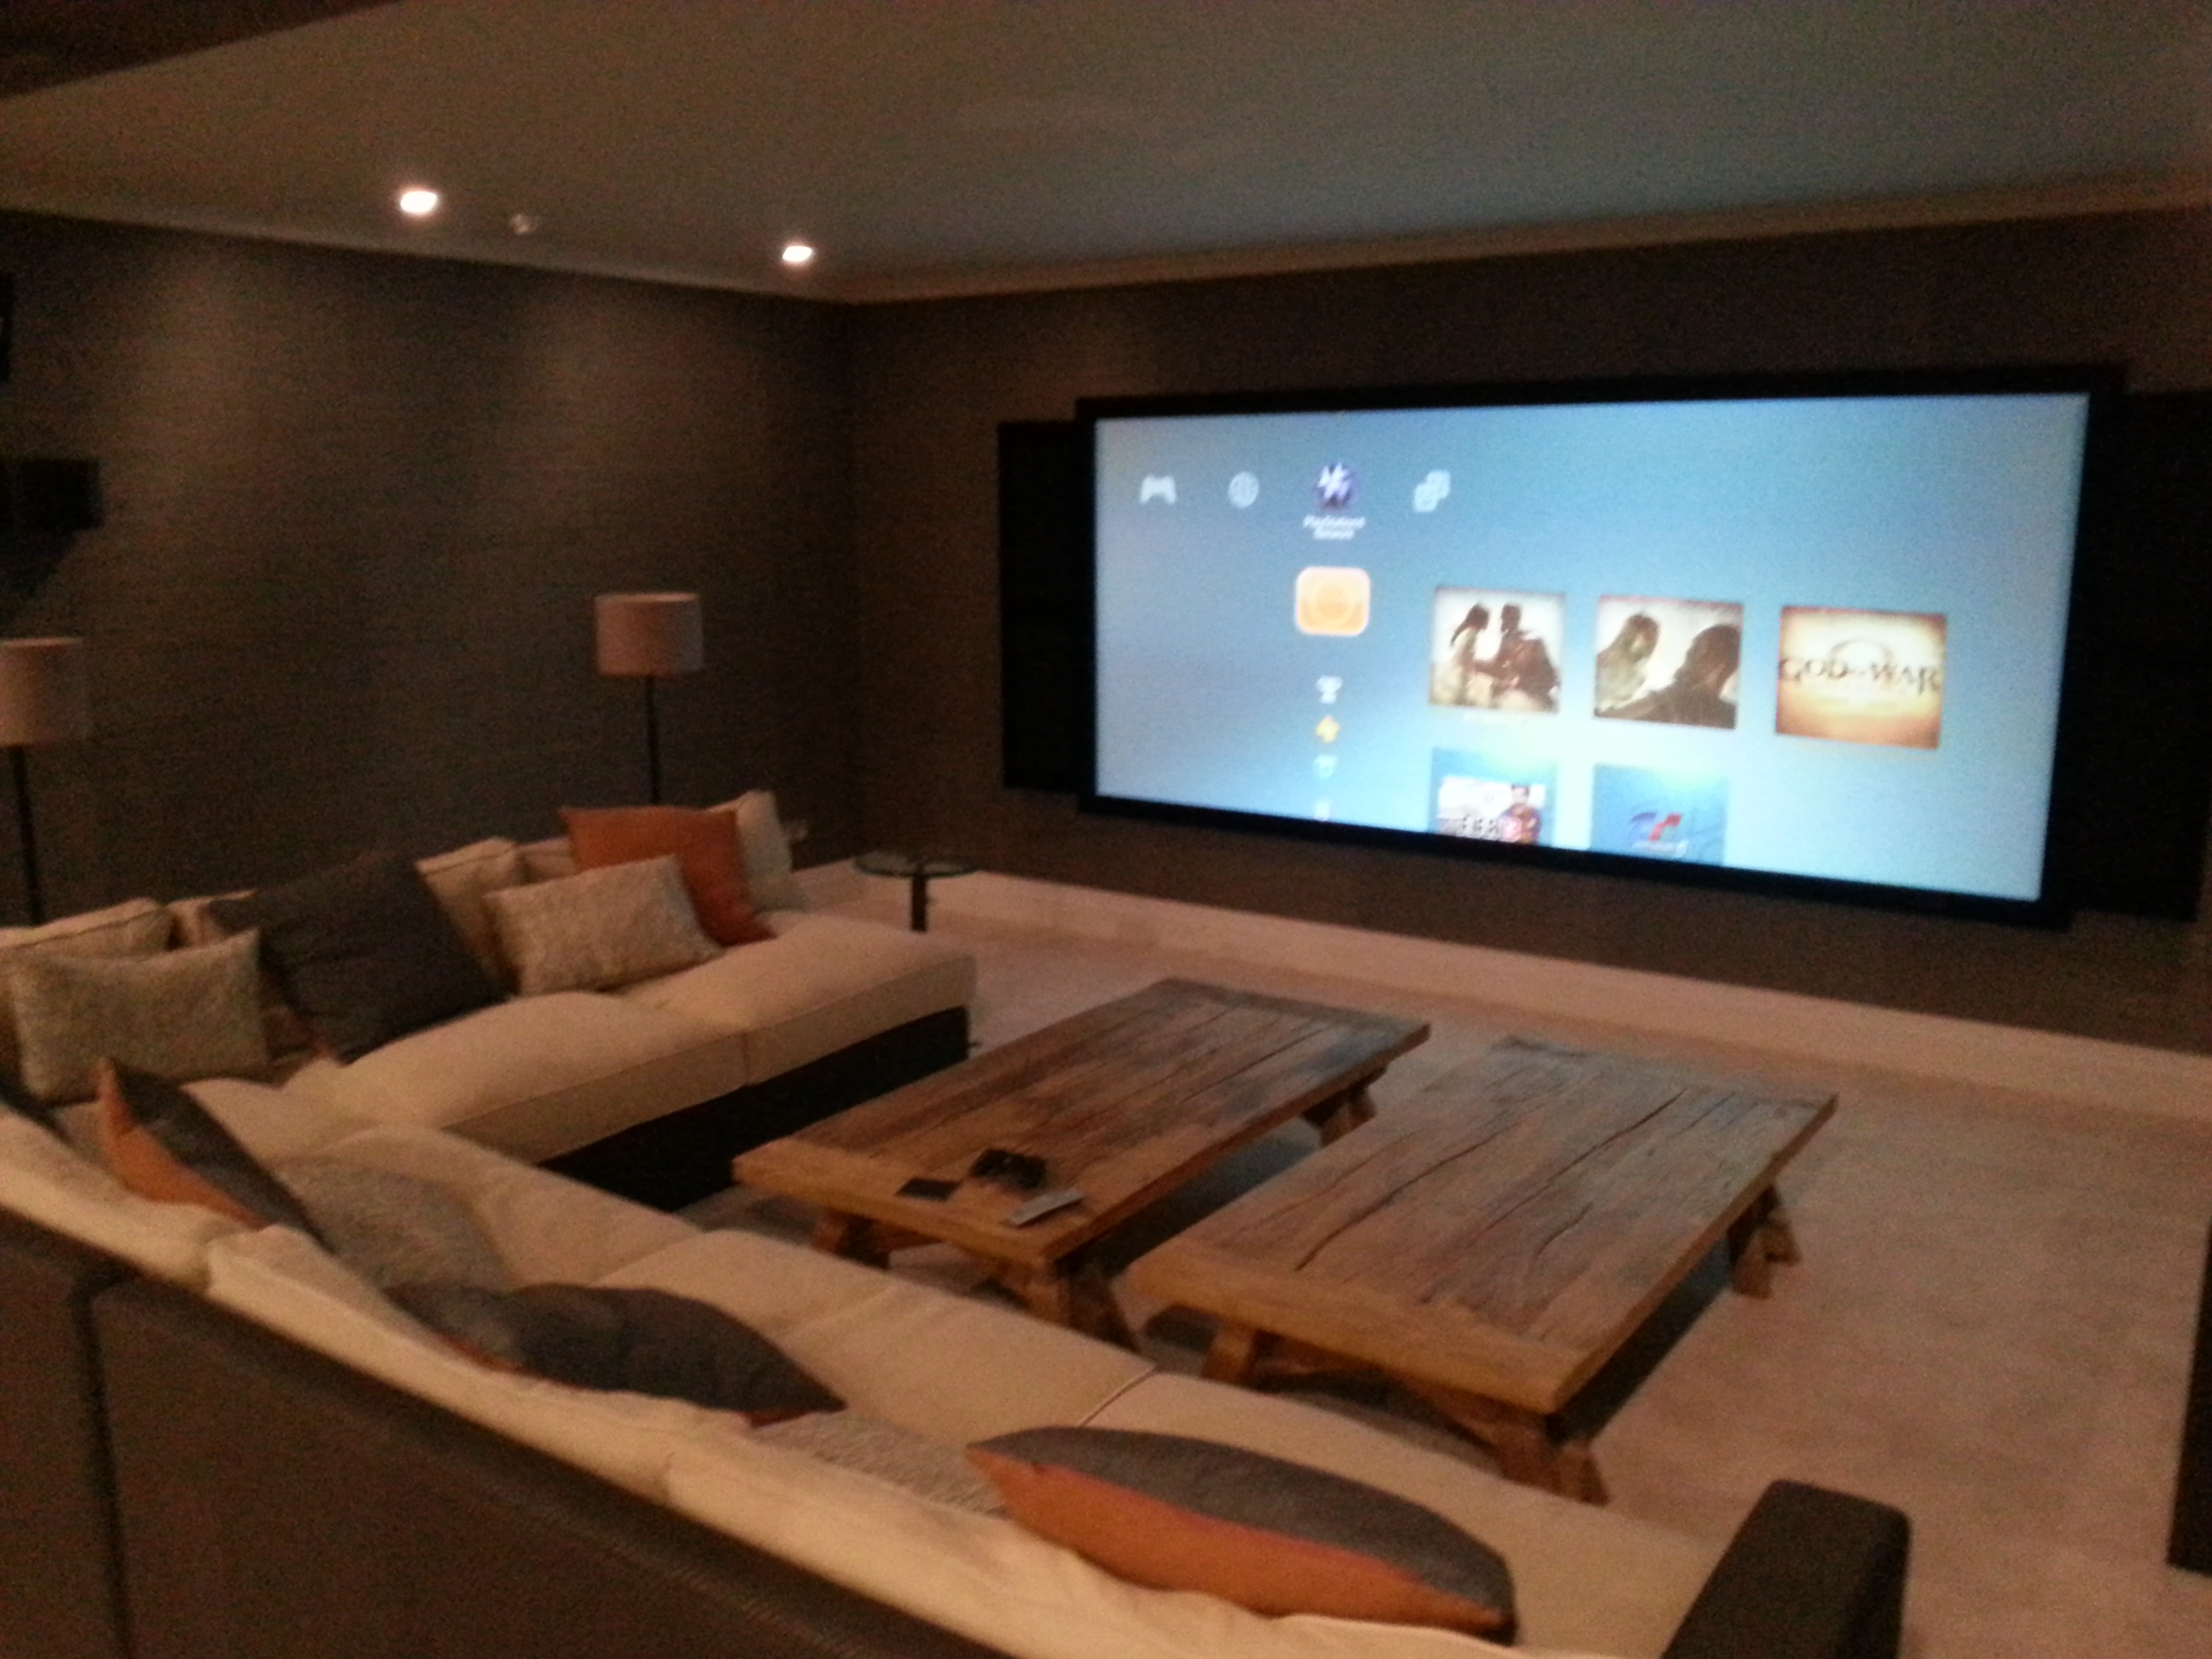 4k cinema system